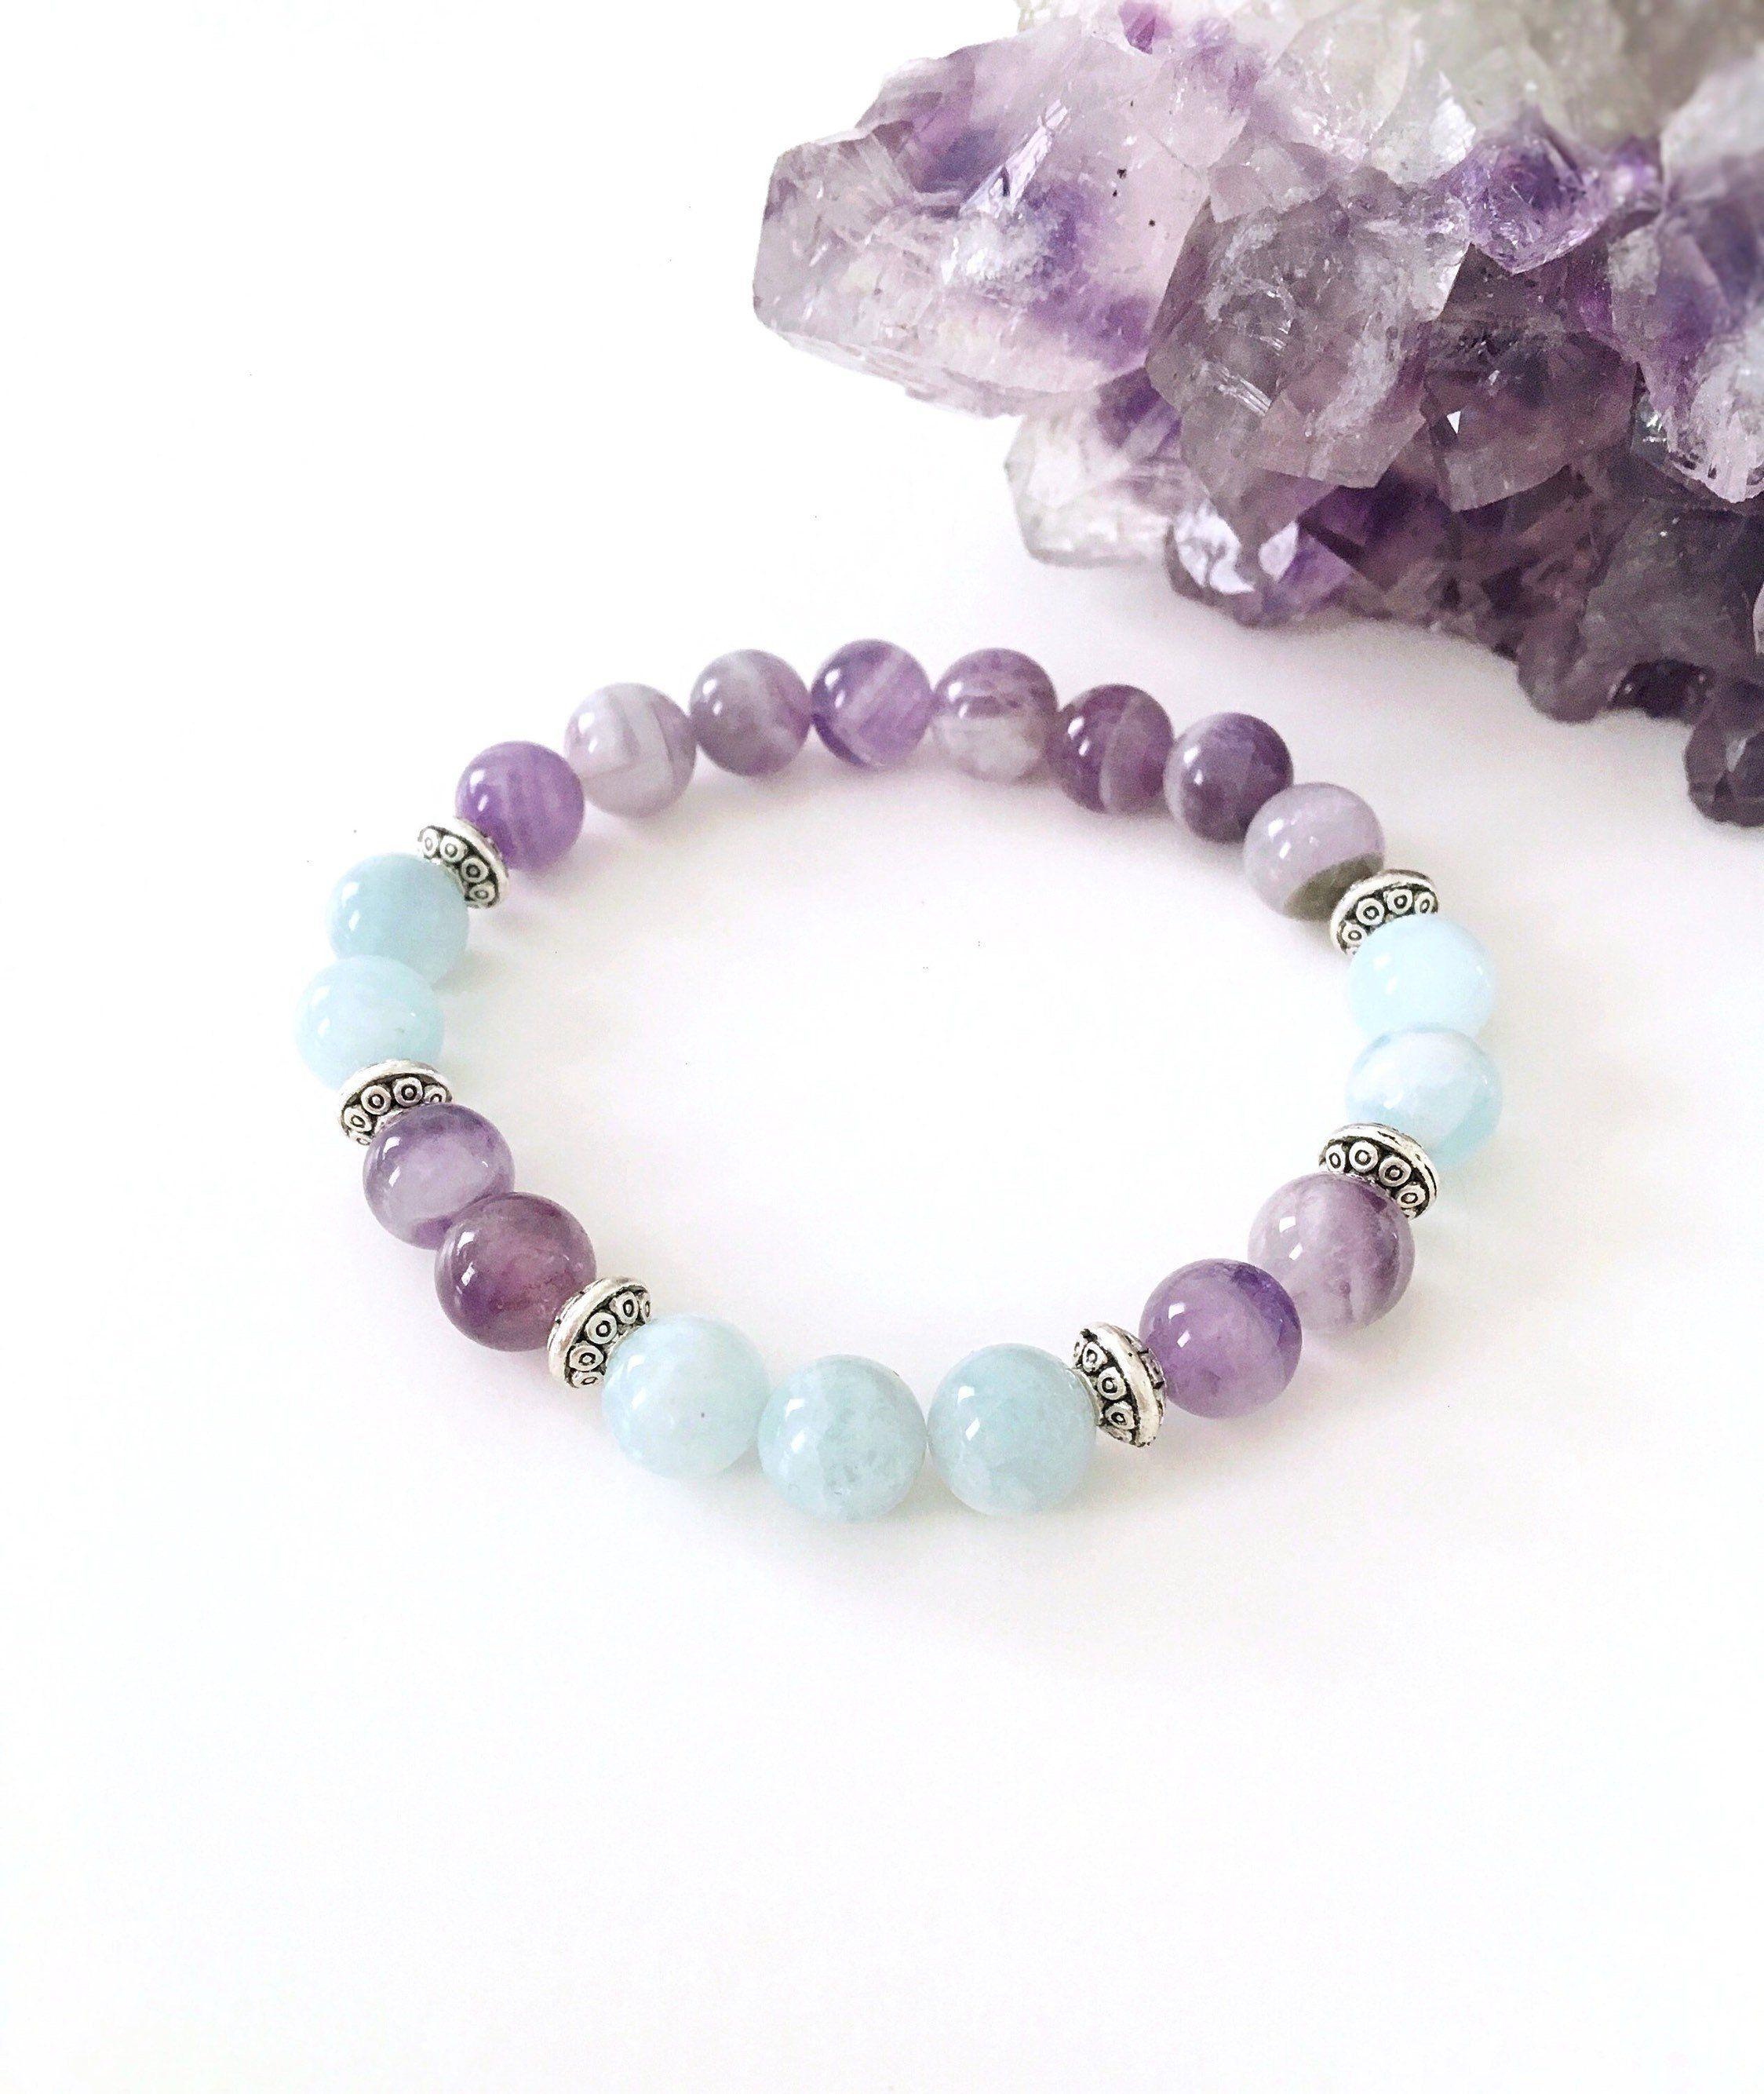 Amethyst Bracelet, Aquamarine Bracelet, Aquamarine And Amethyst Crystal Bracelet, Gemstone Bracelet, Healing Gemstones #gemstonejewelry